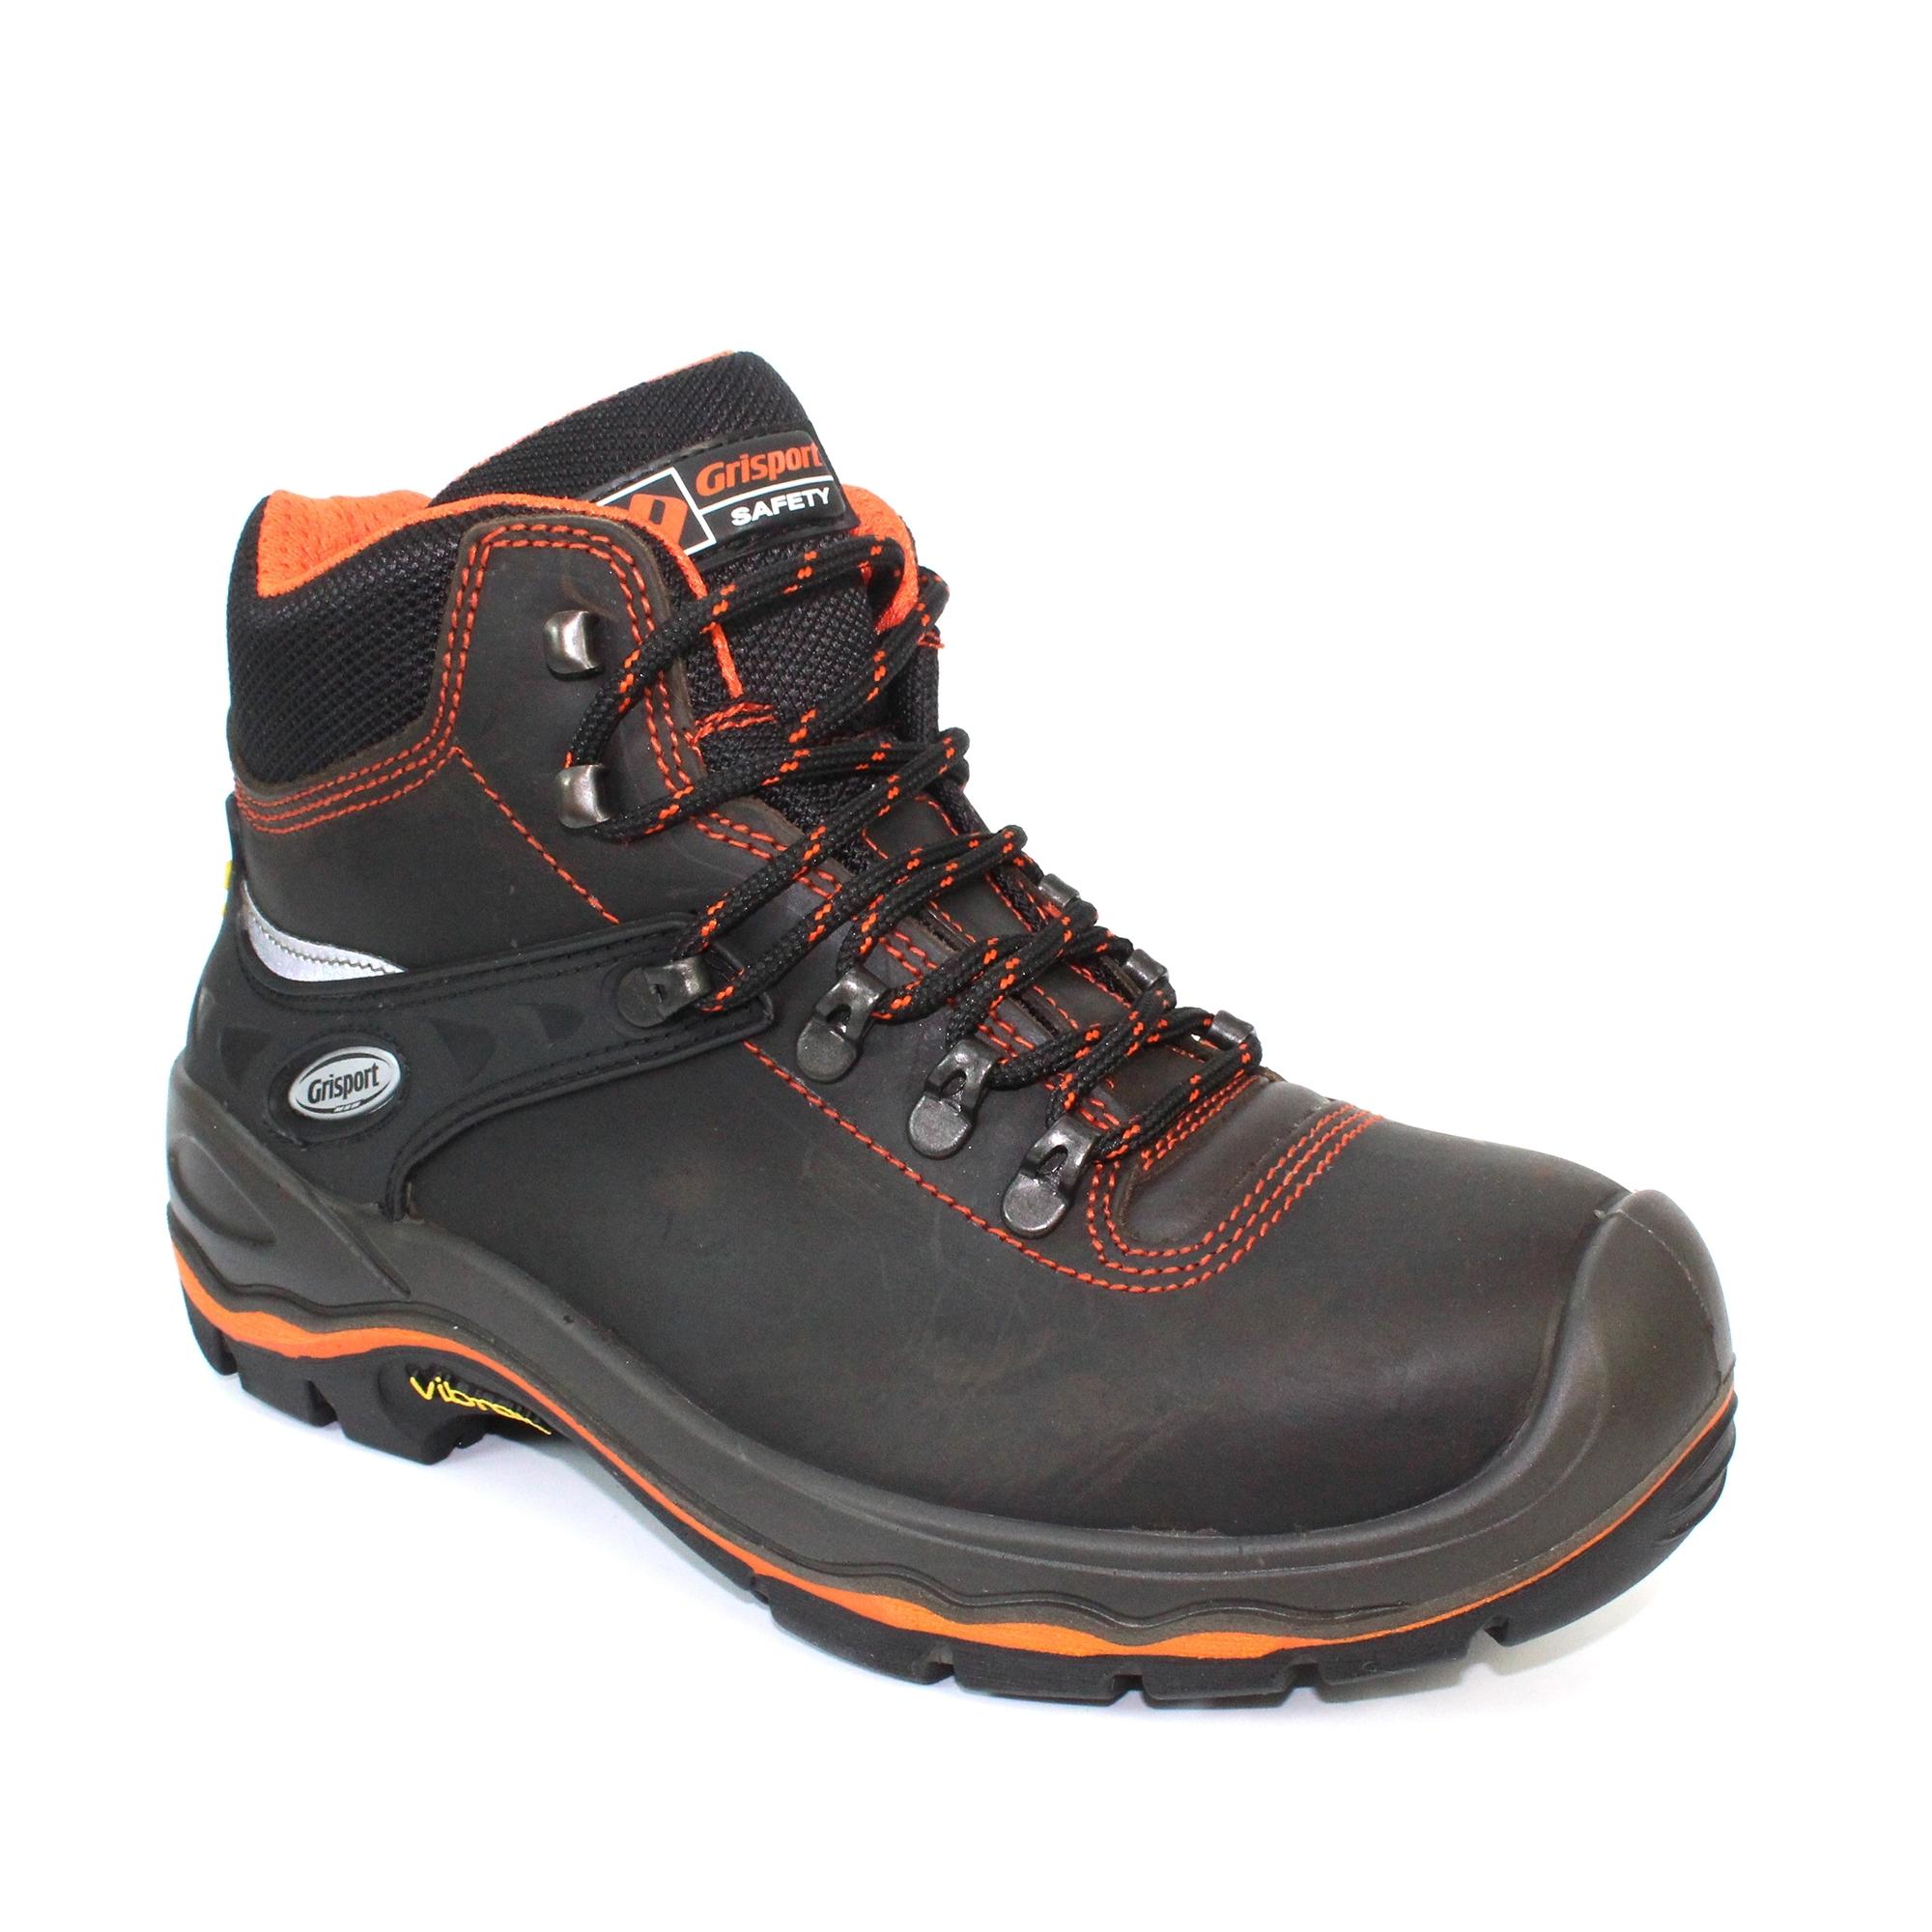 093e95faa08 Gri Sport Hammer S3 Safety Boot